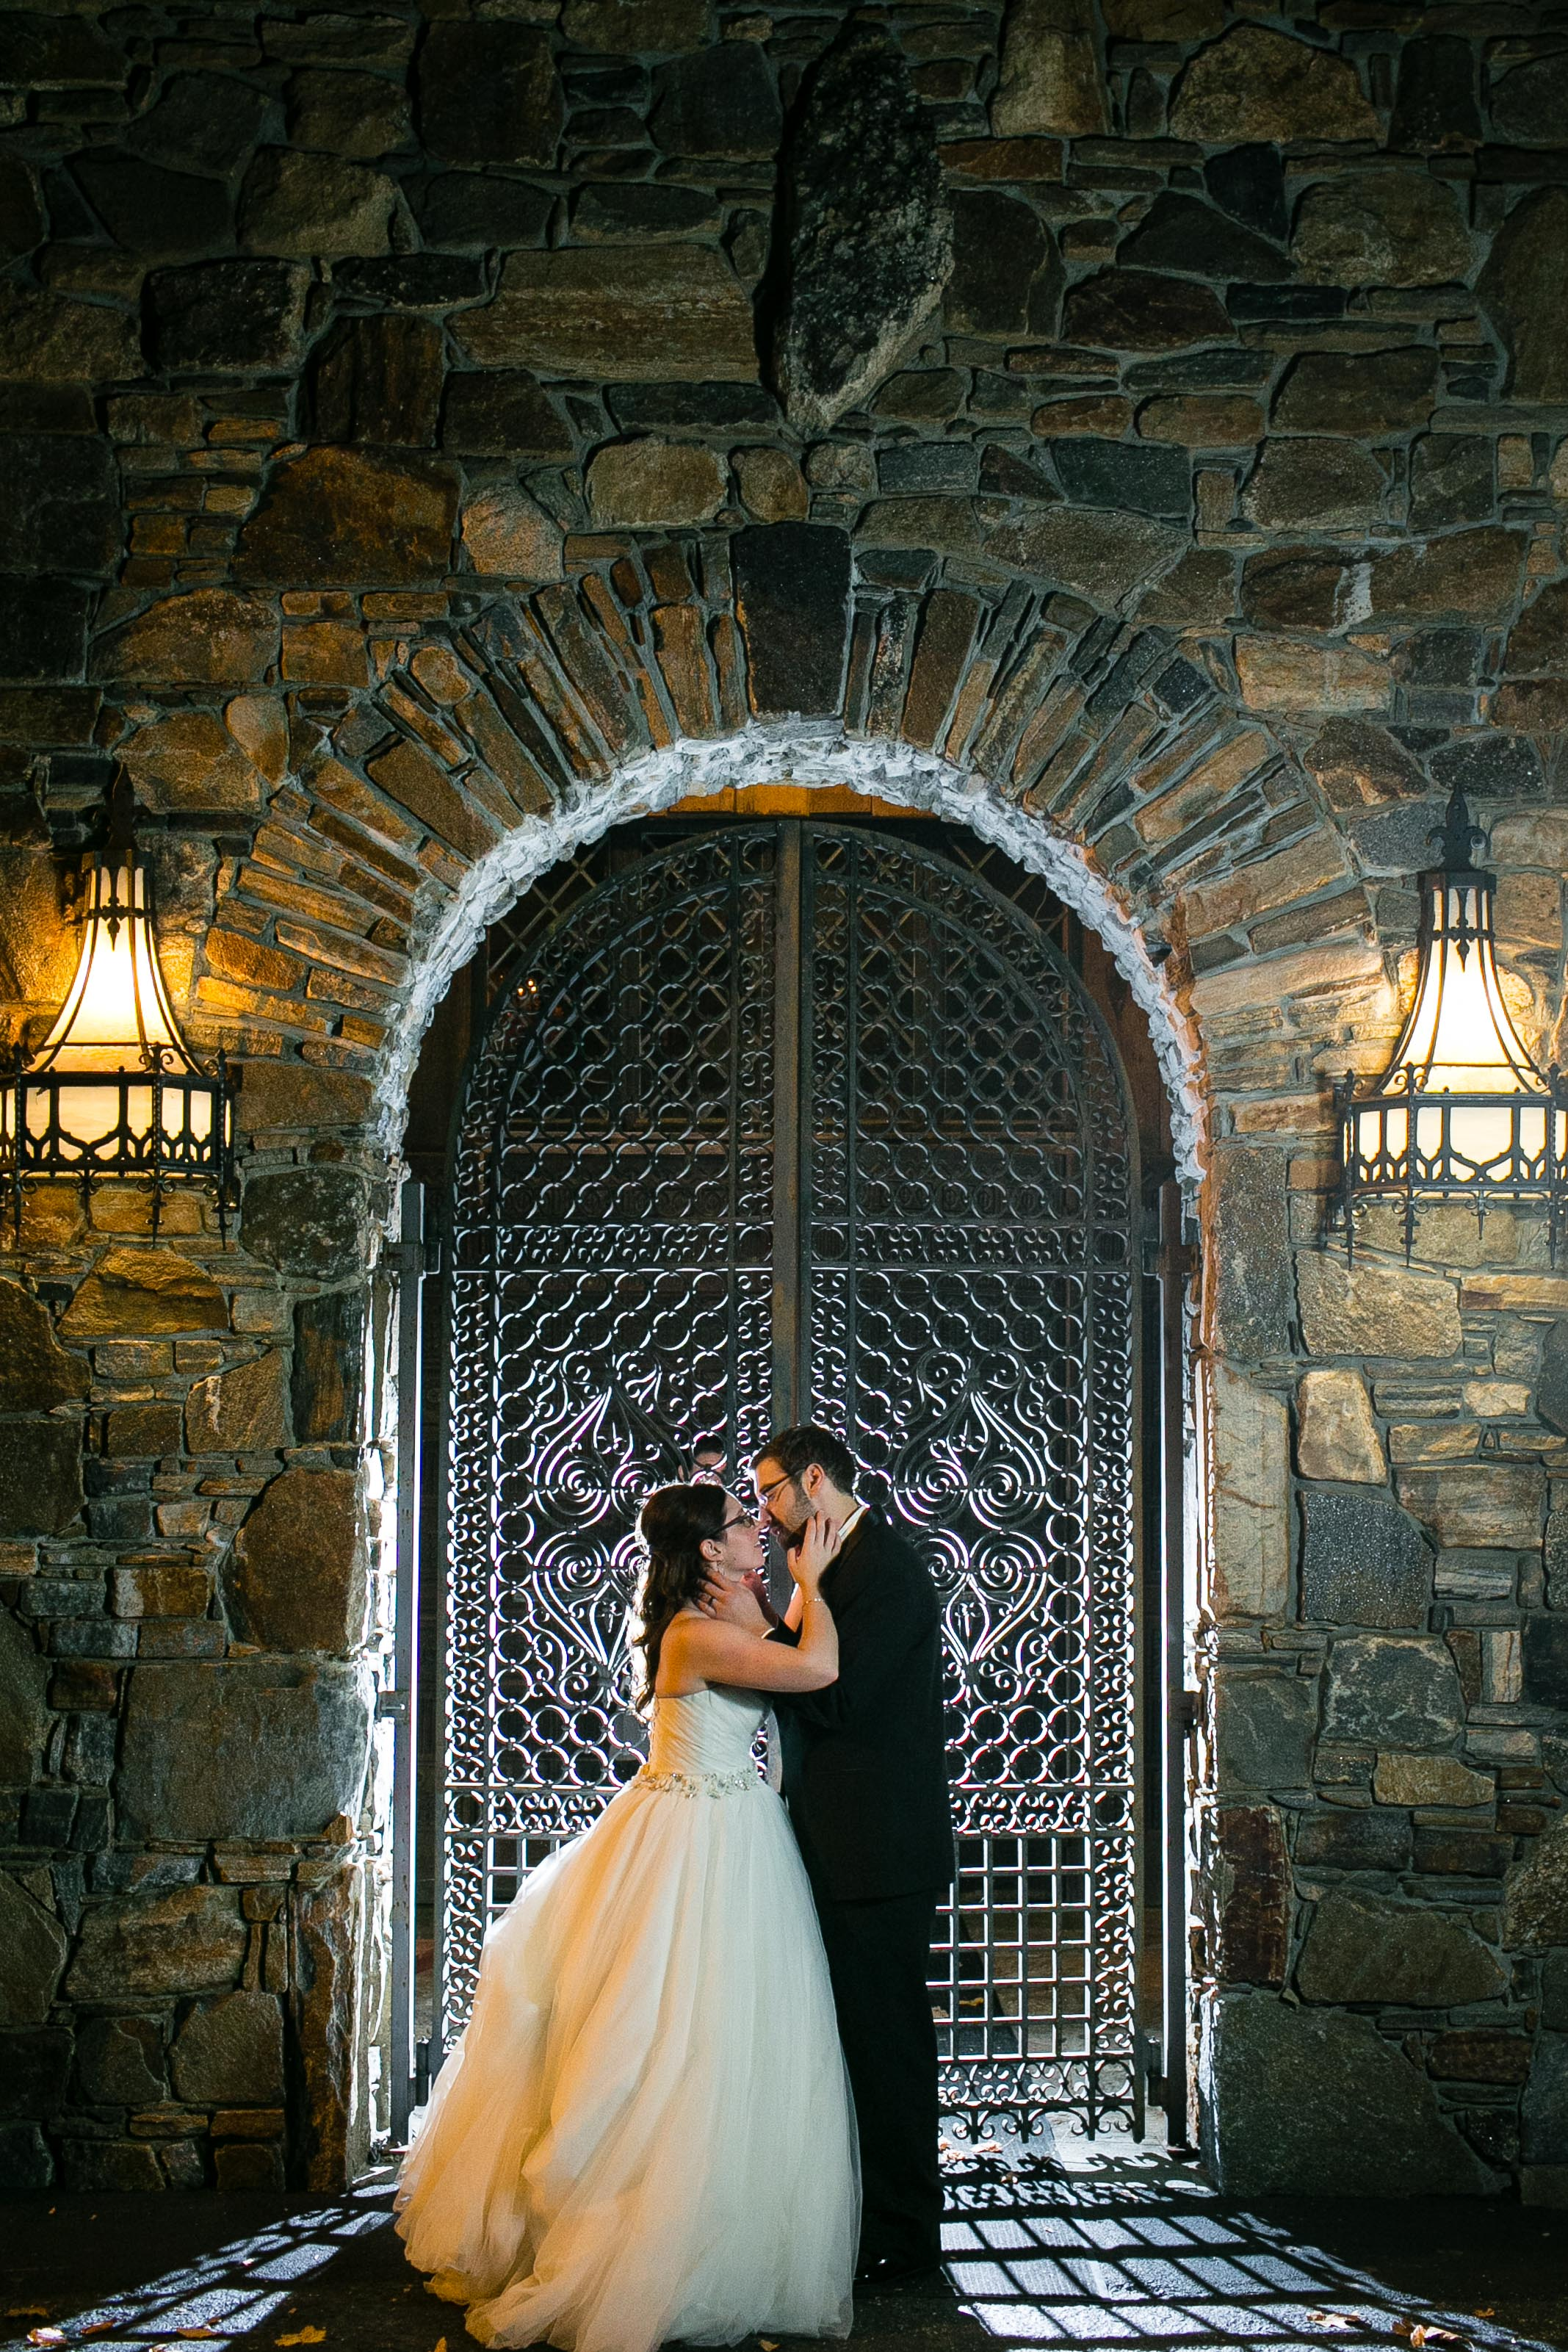 Creative-Wedding-Photography-Bill-Millers-Castle-Connecticut-Jacek-Dolata-Photography-2.jpg